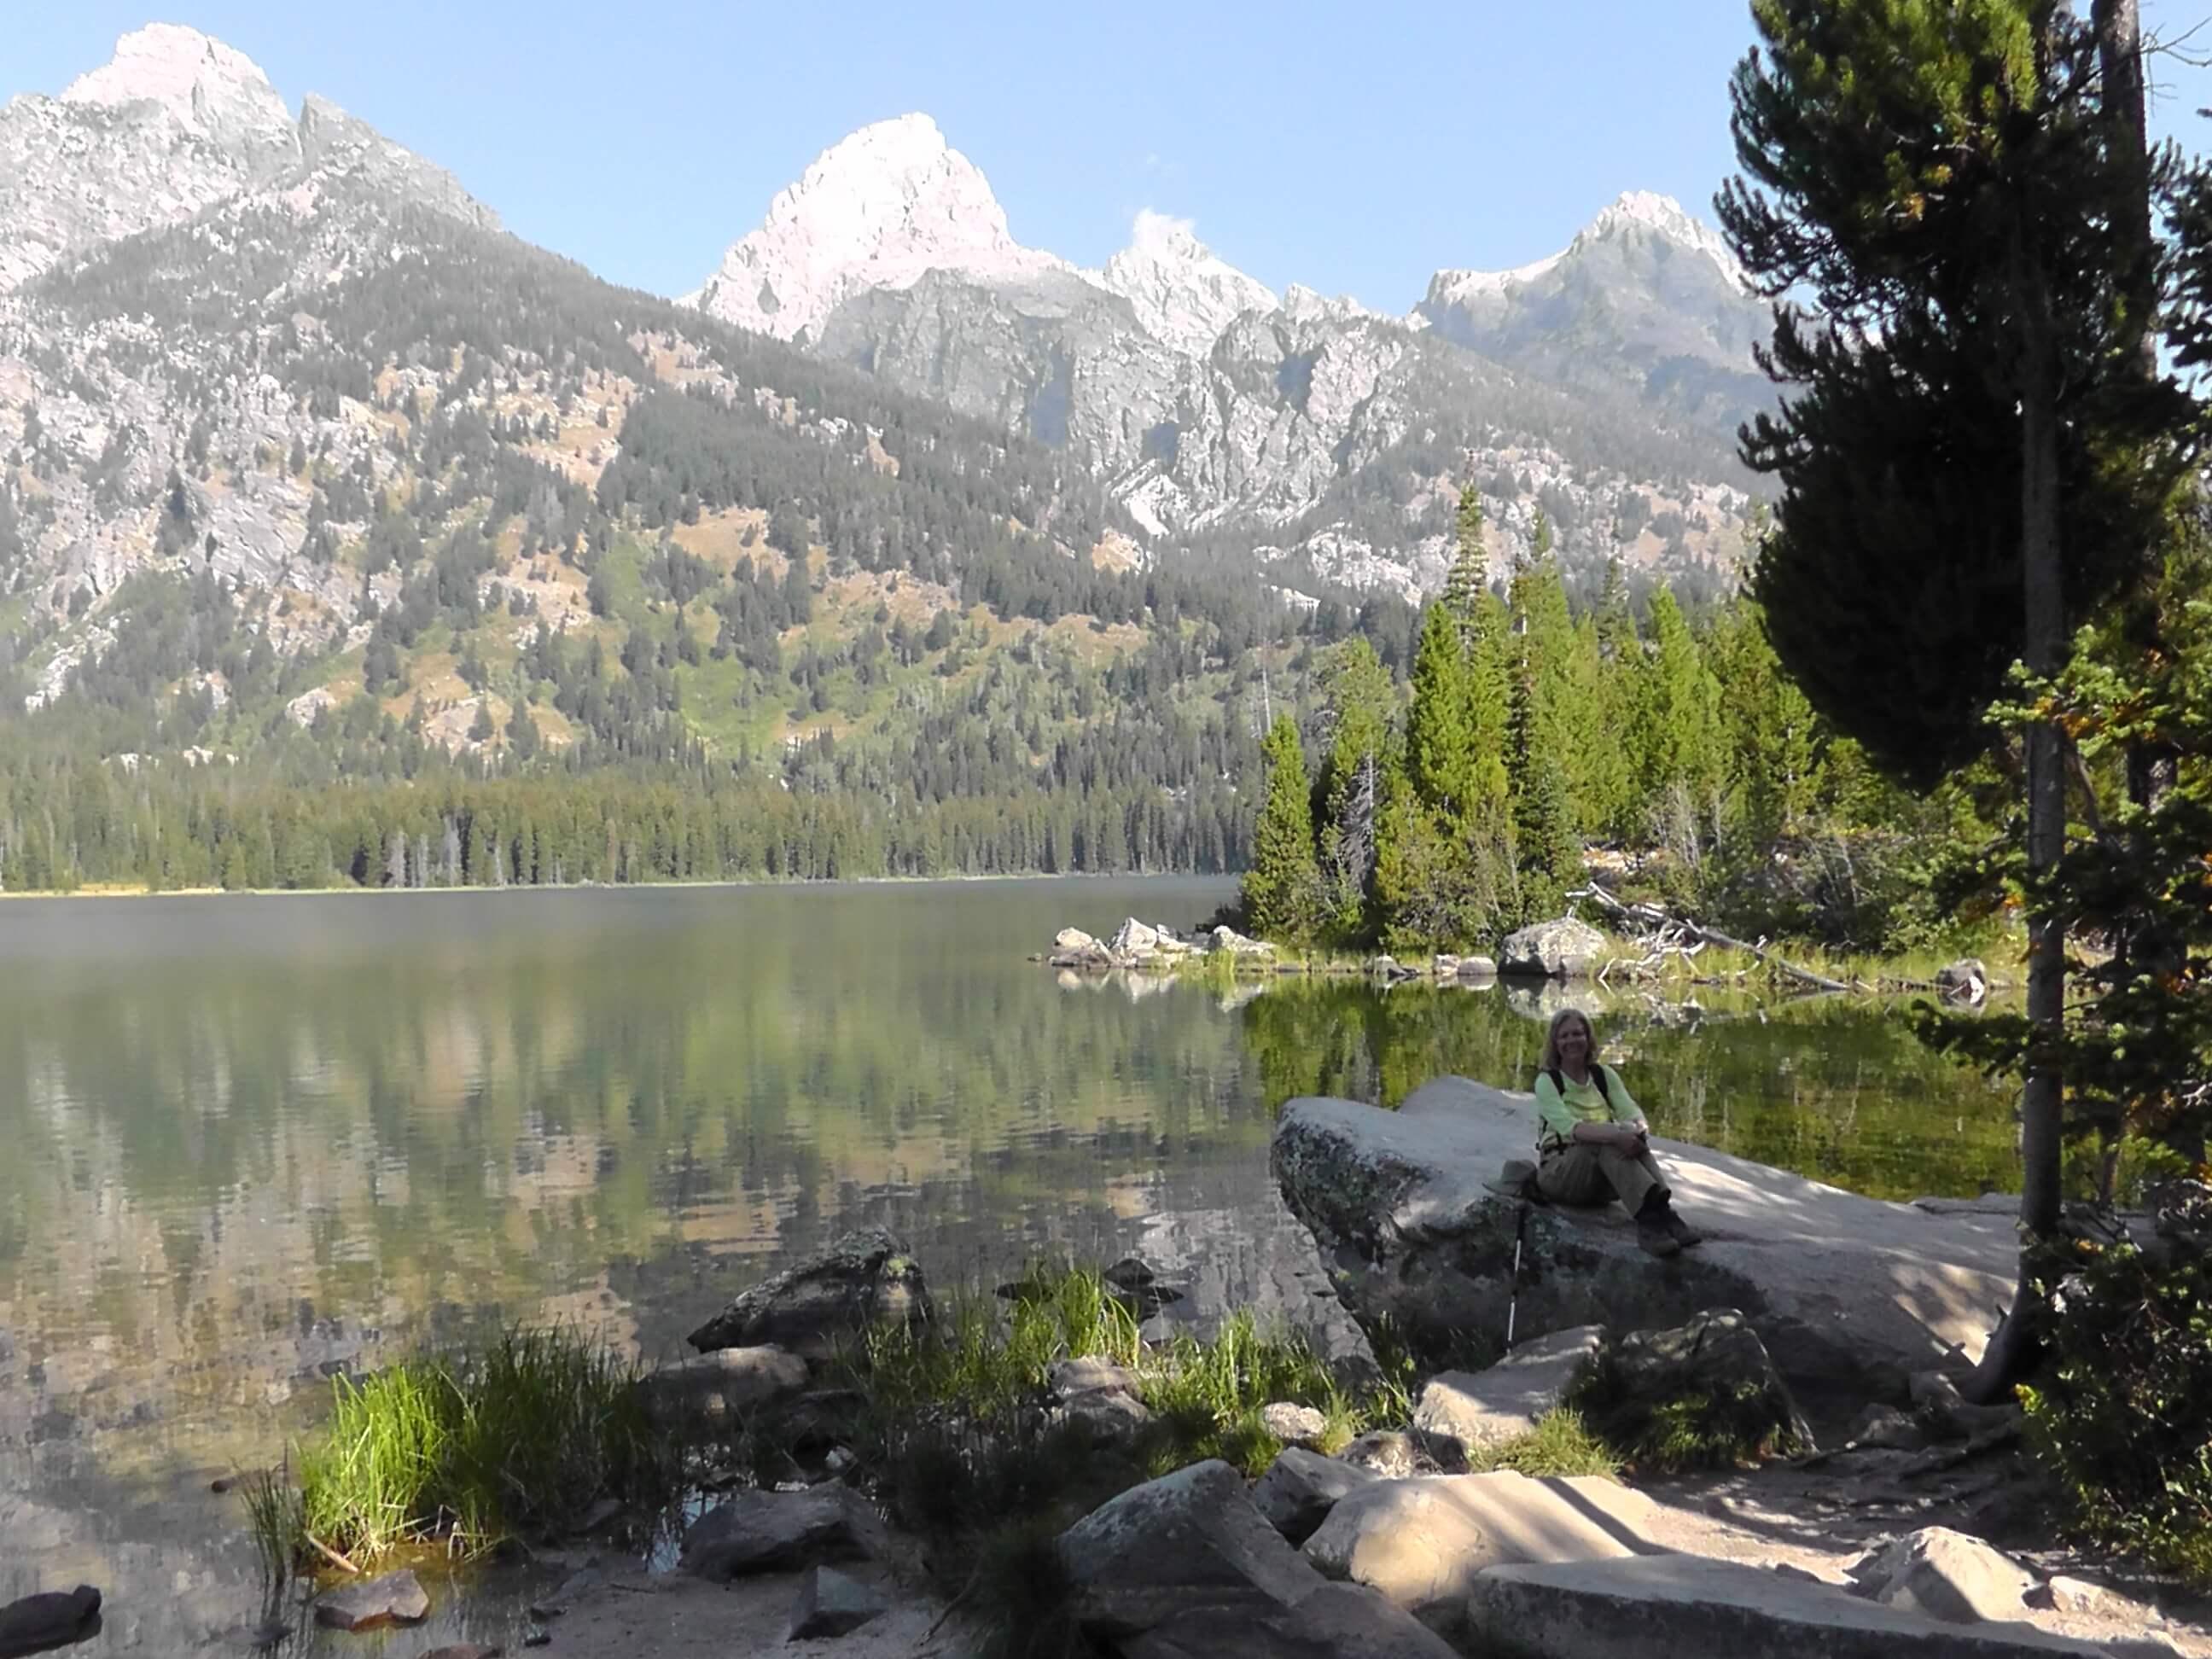 Taggart Lake, Grand Teton National Park